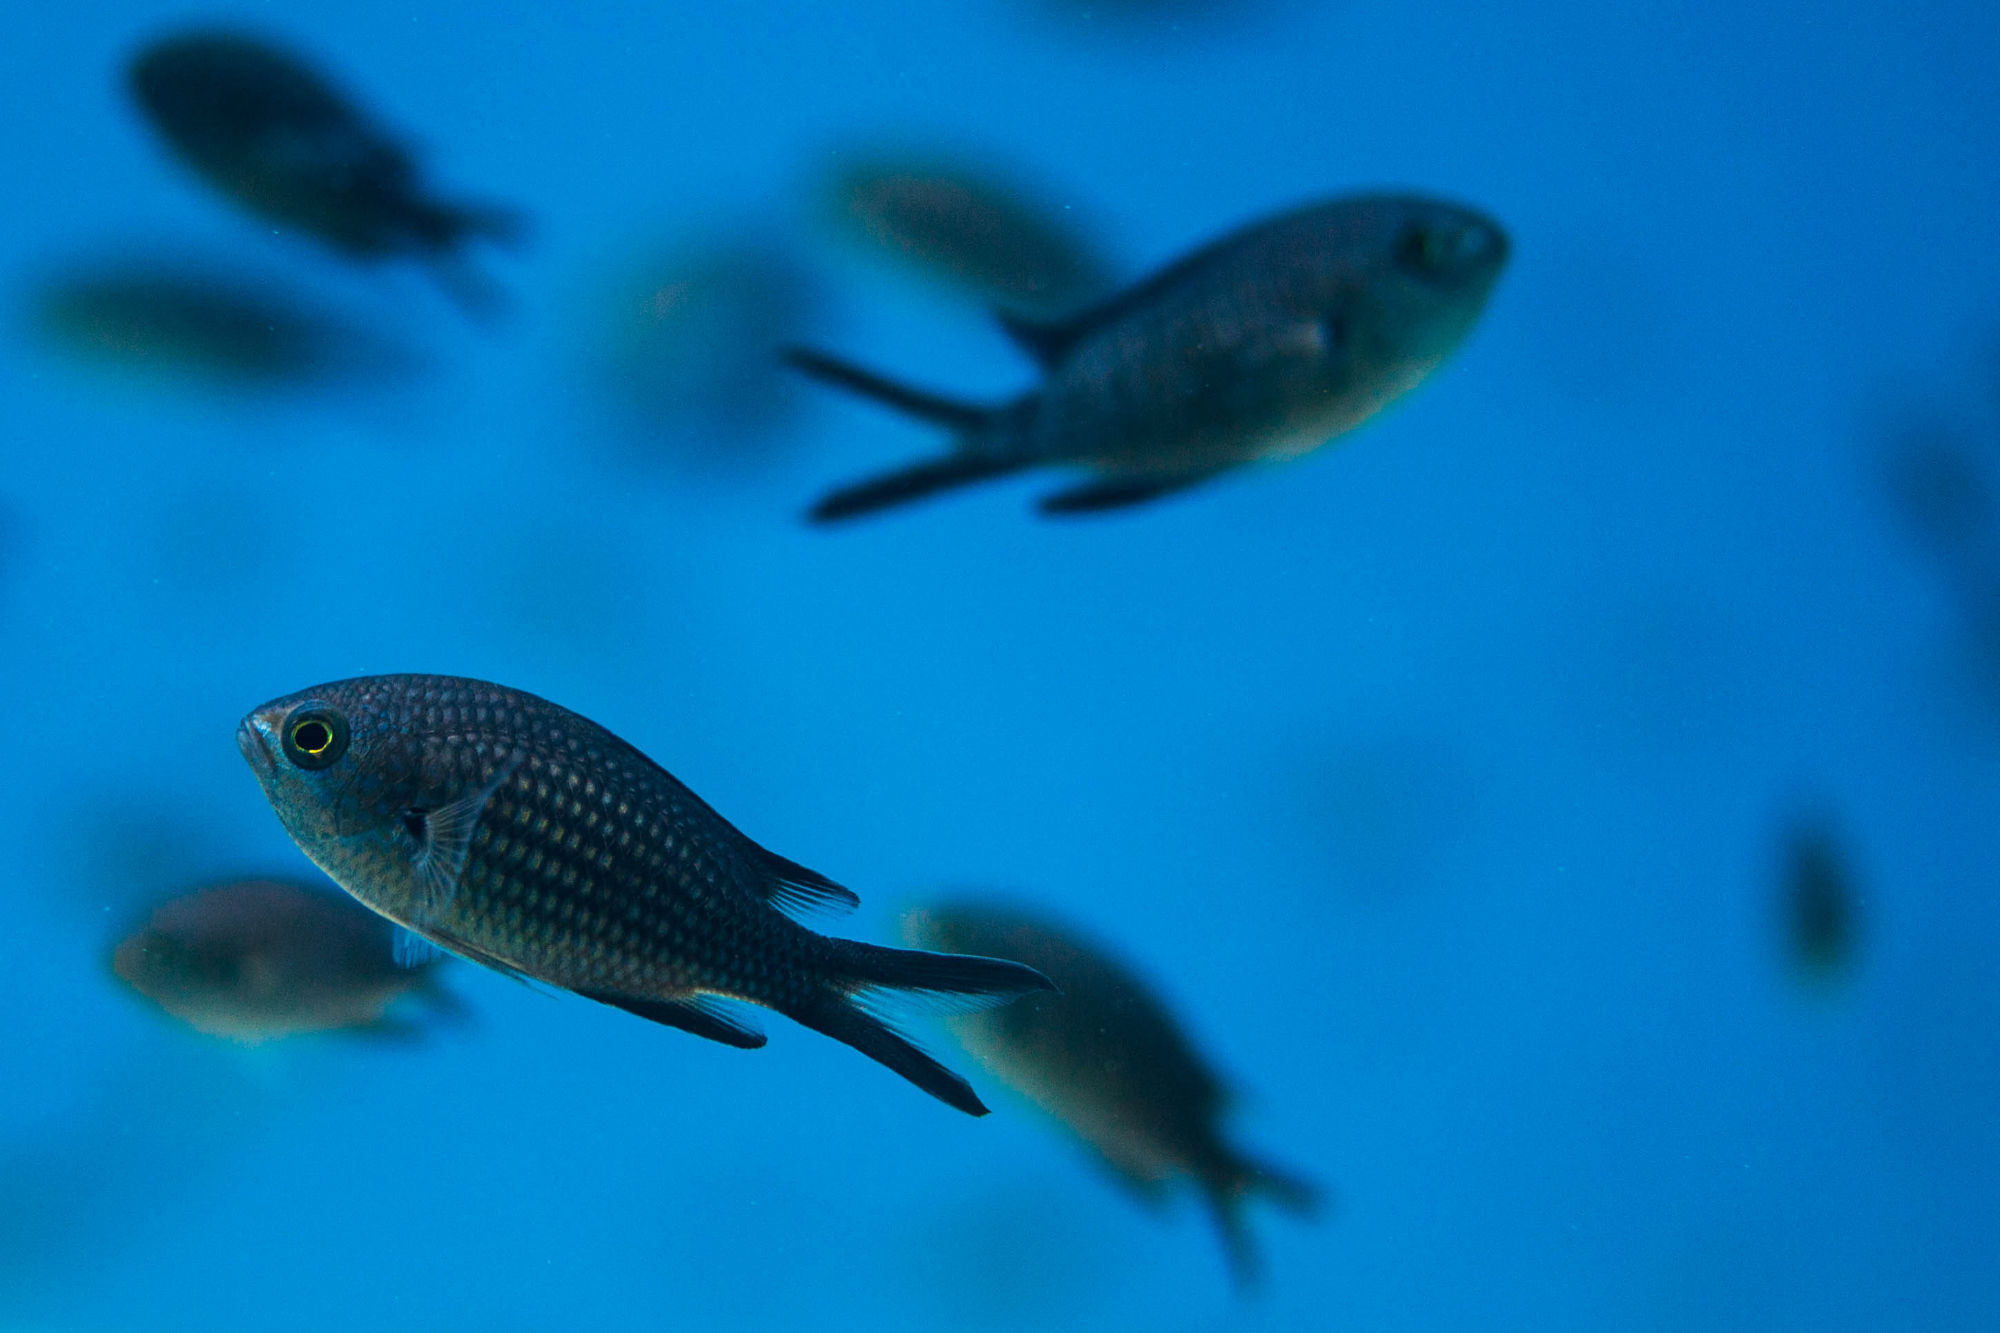 A School of Damselfish in the Blue of the Adriatic Sea